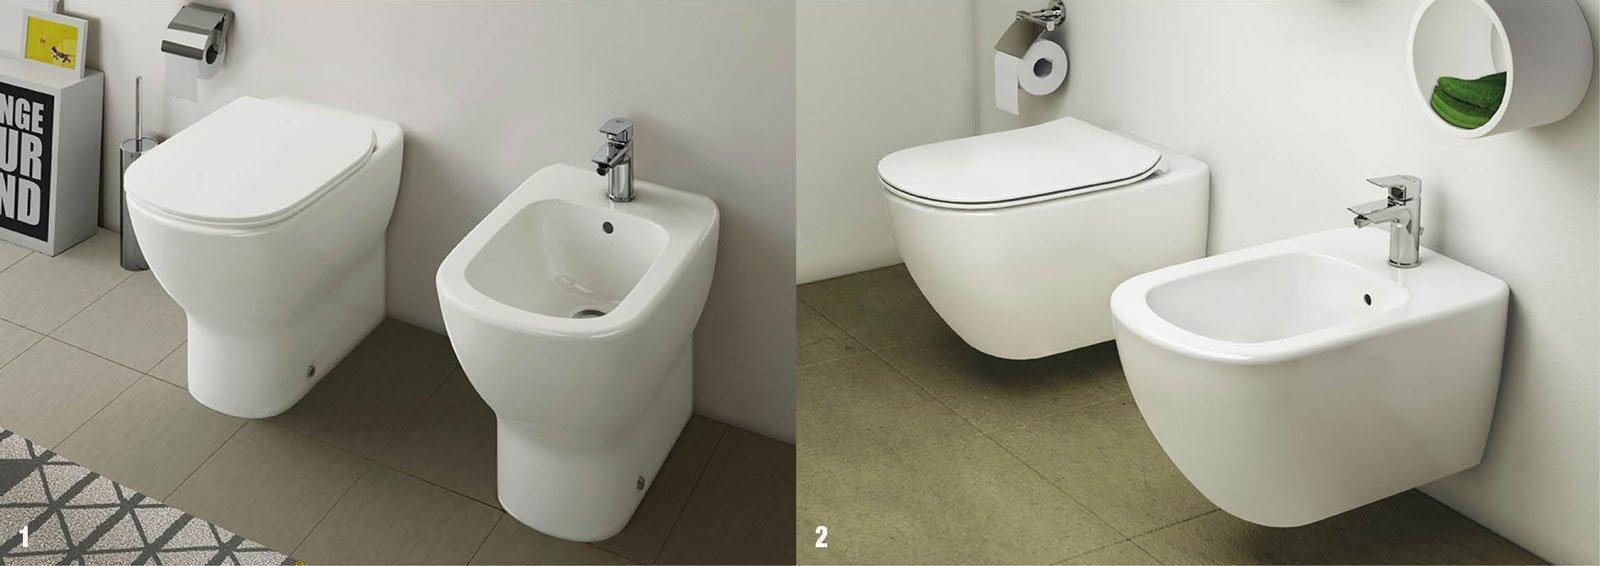 tesi e ceramix per un bagno di tendenza cose di casa. Black Bedroom Furniture Sets. Home Design Ideas